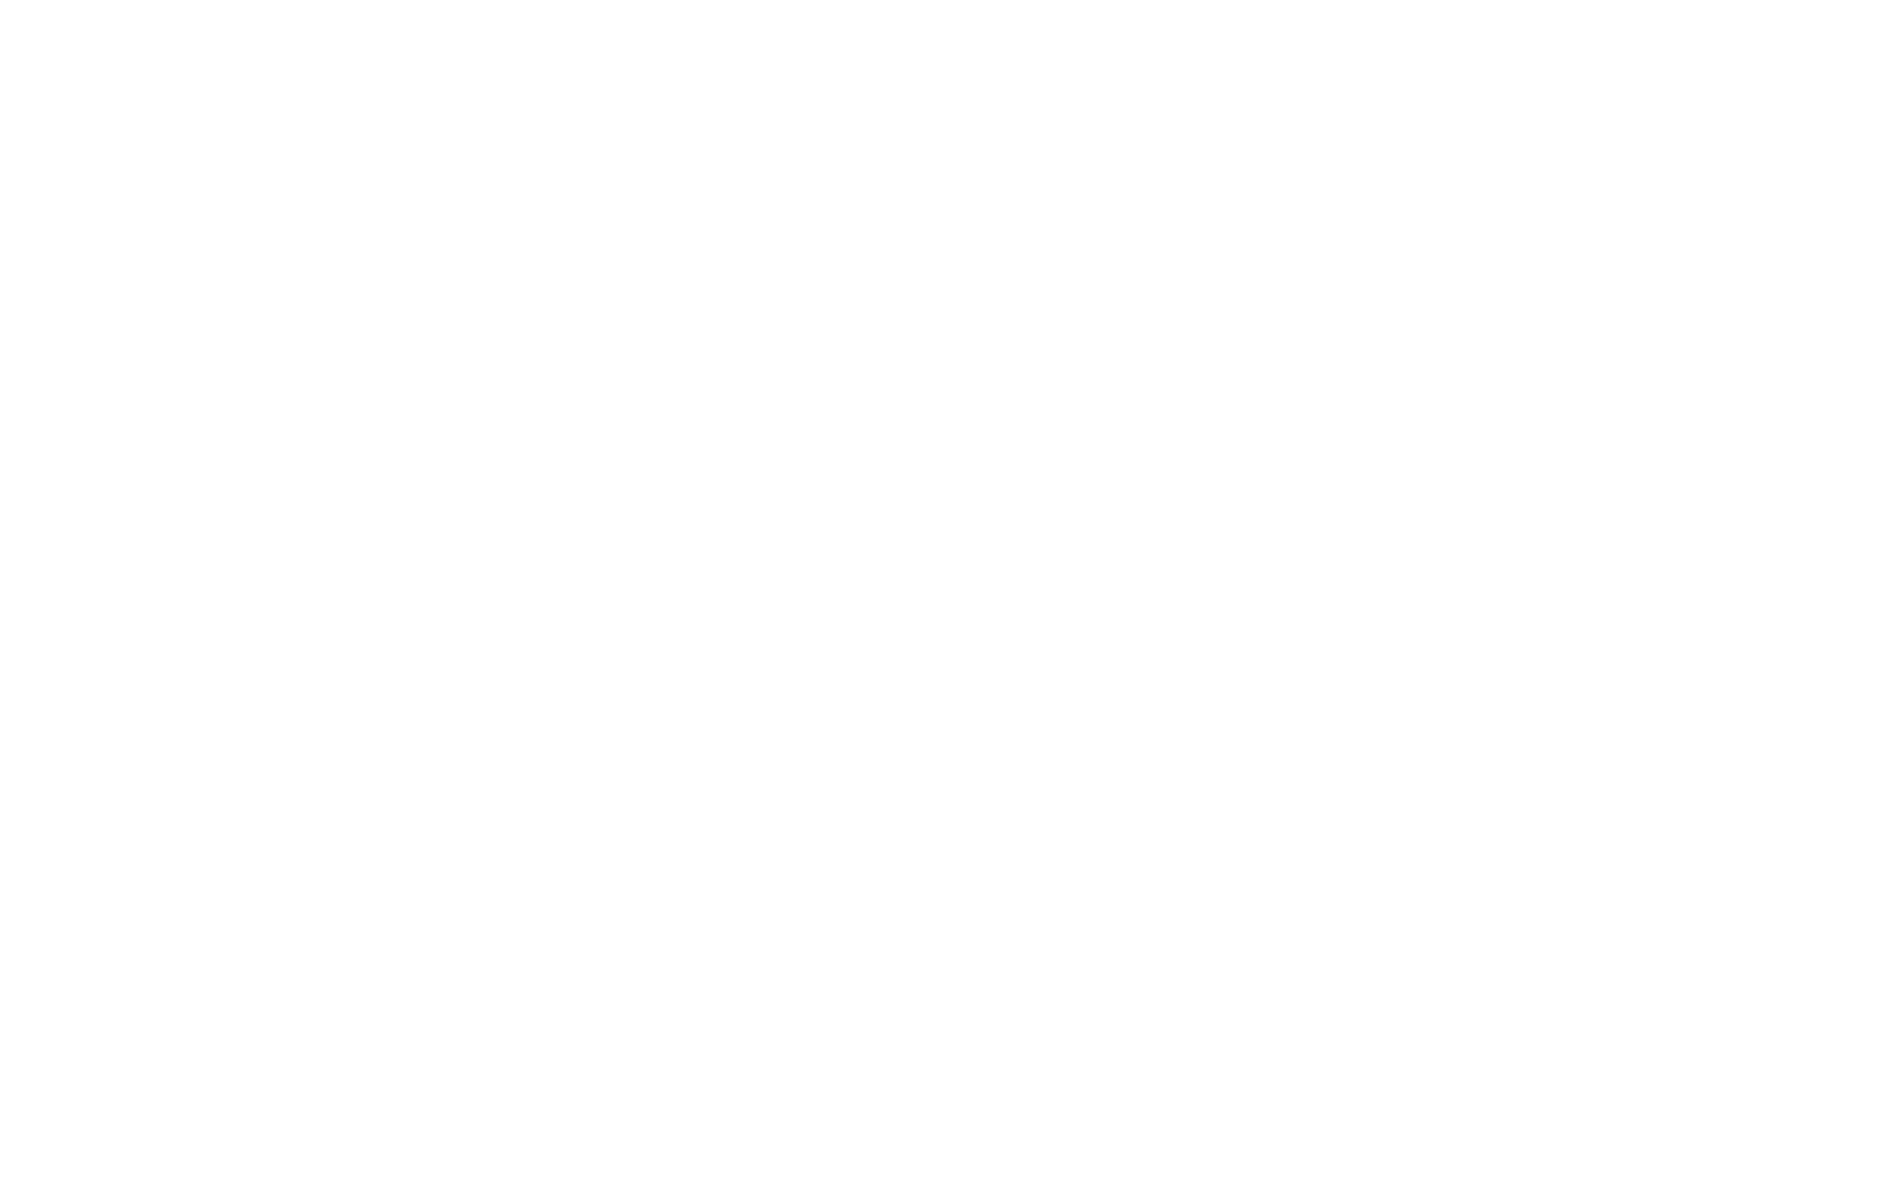 paski overlay